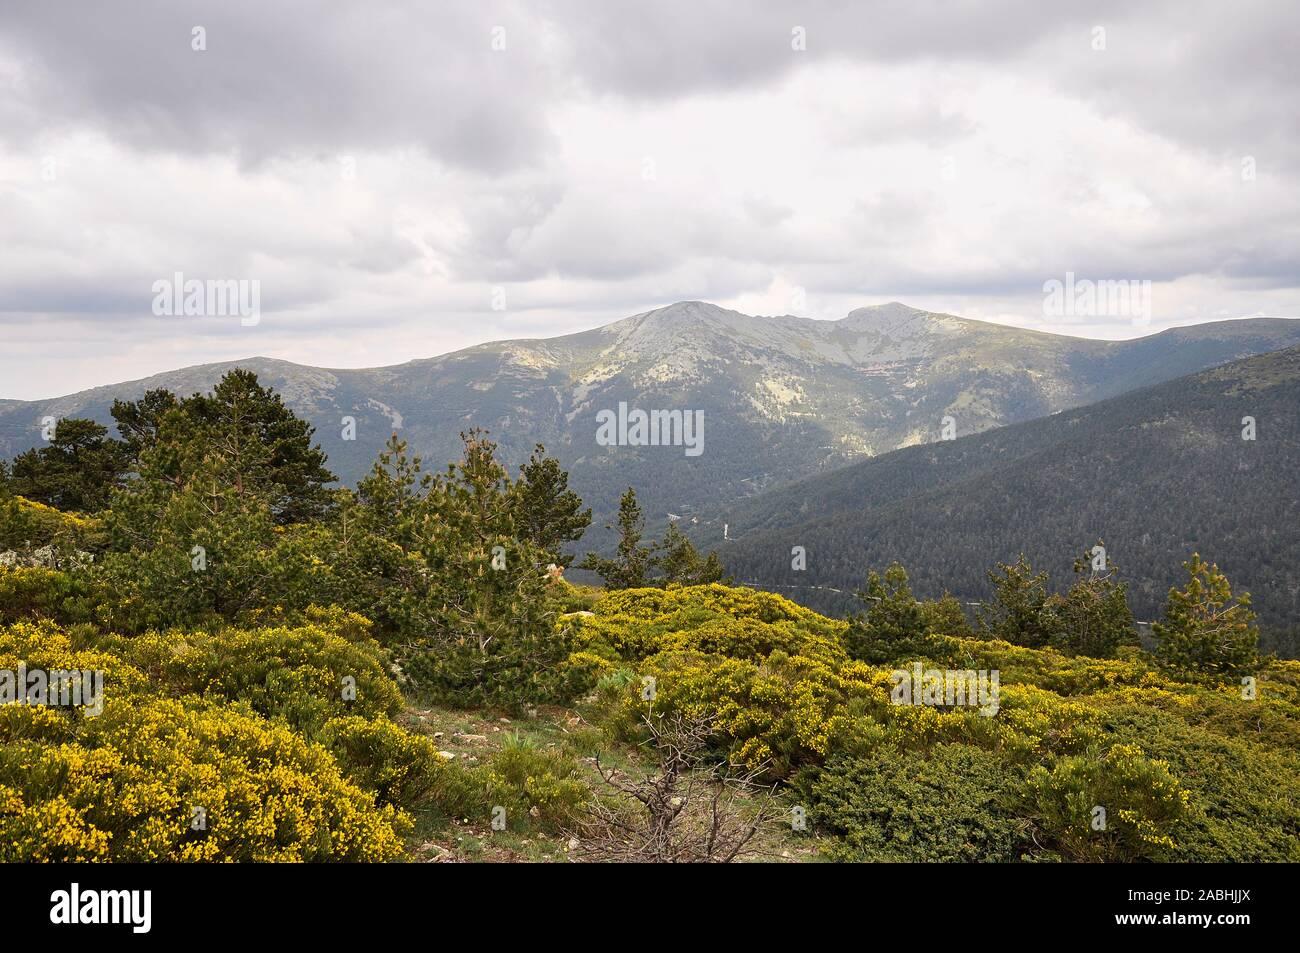 Scenic view of La Mujer Muerta subrange, formed by La Pinareja, Peña el Oso and Pasapán peaks (El Espinar, Guadarrama National Park, Segovia, Spain) Stock Photo